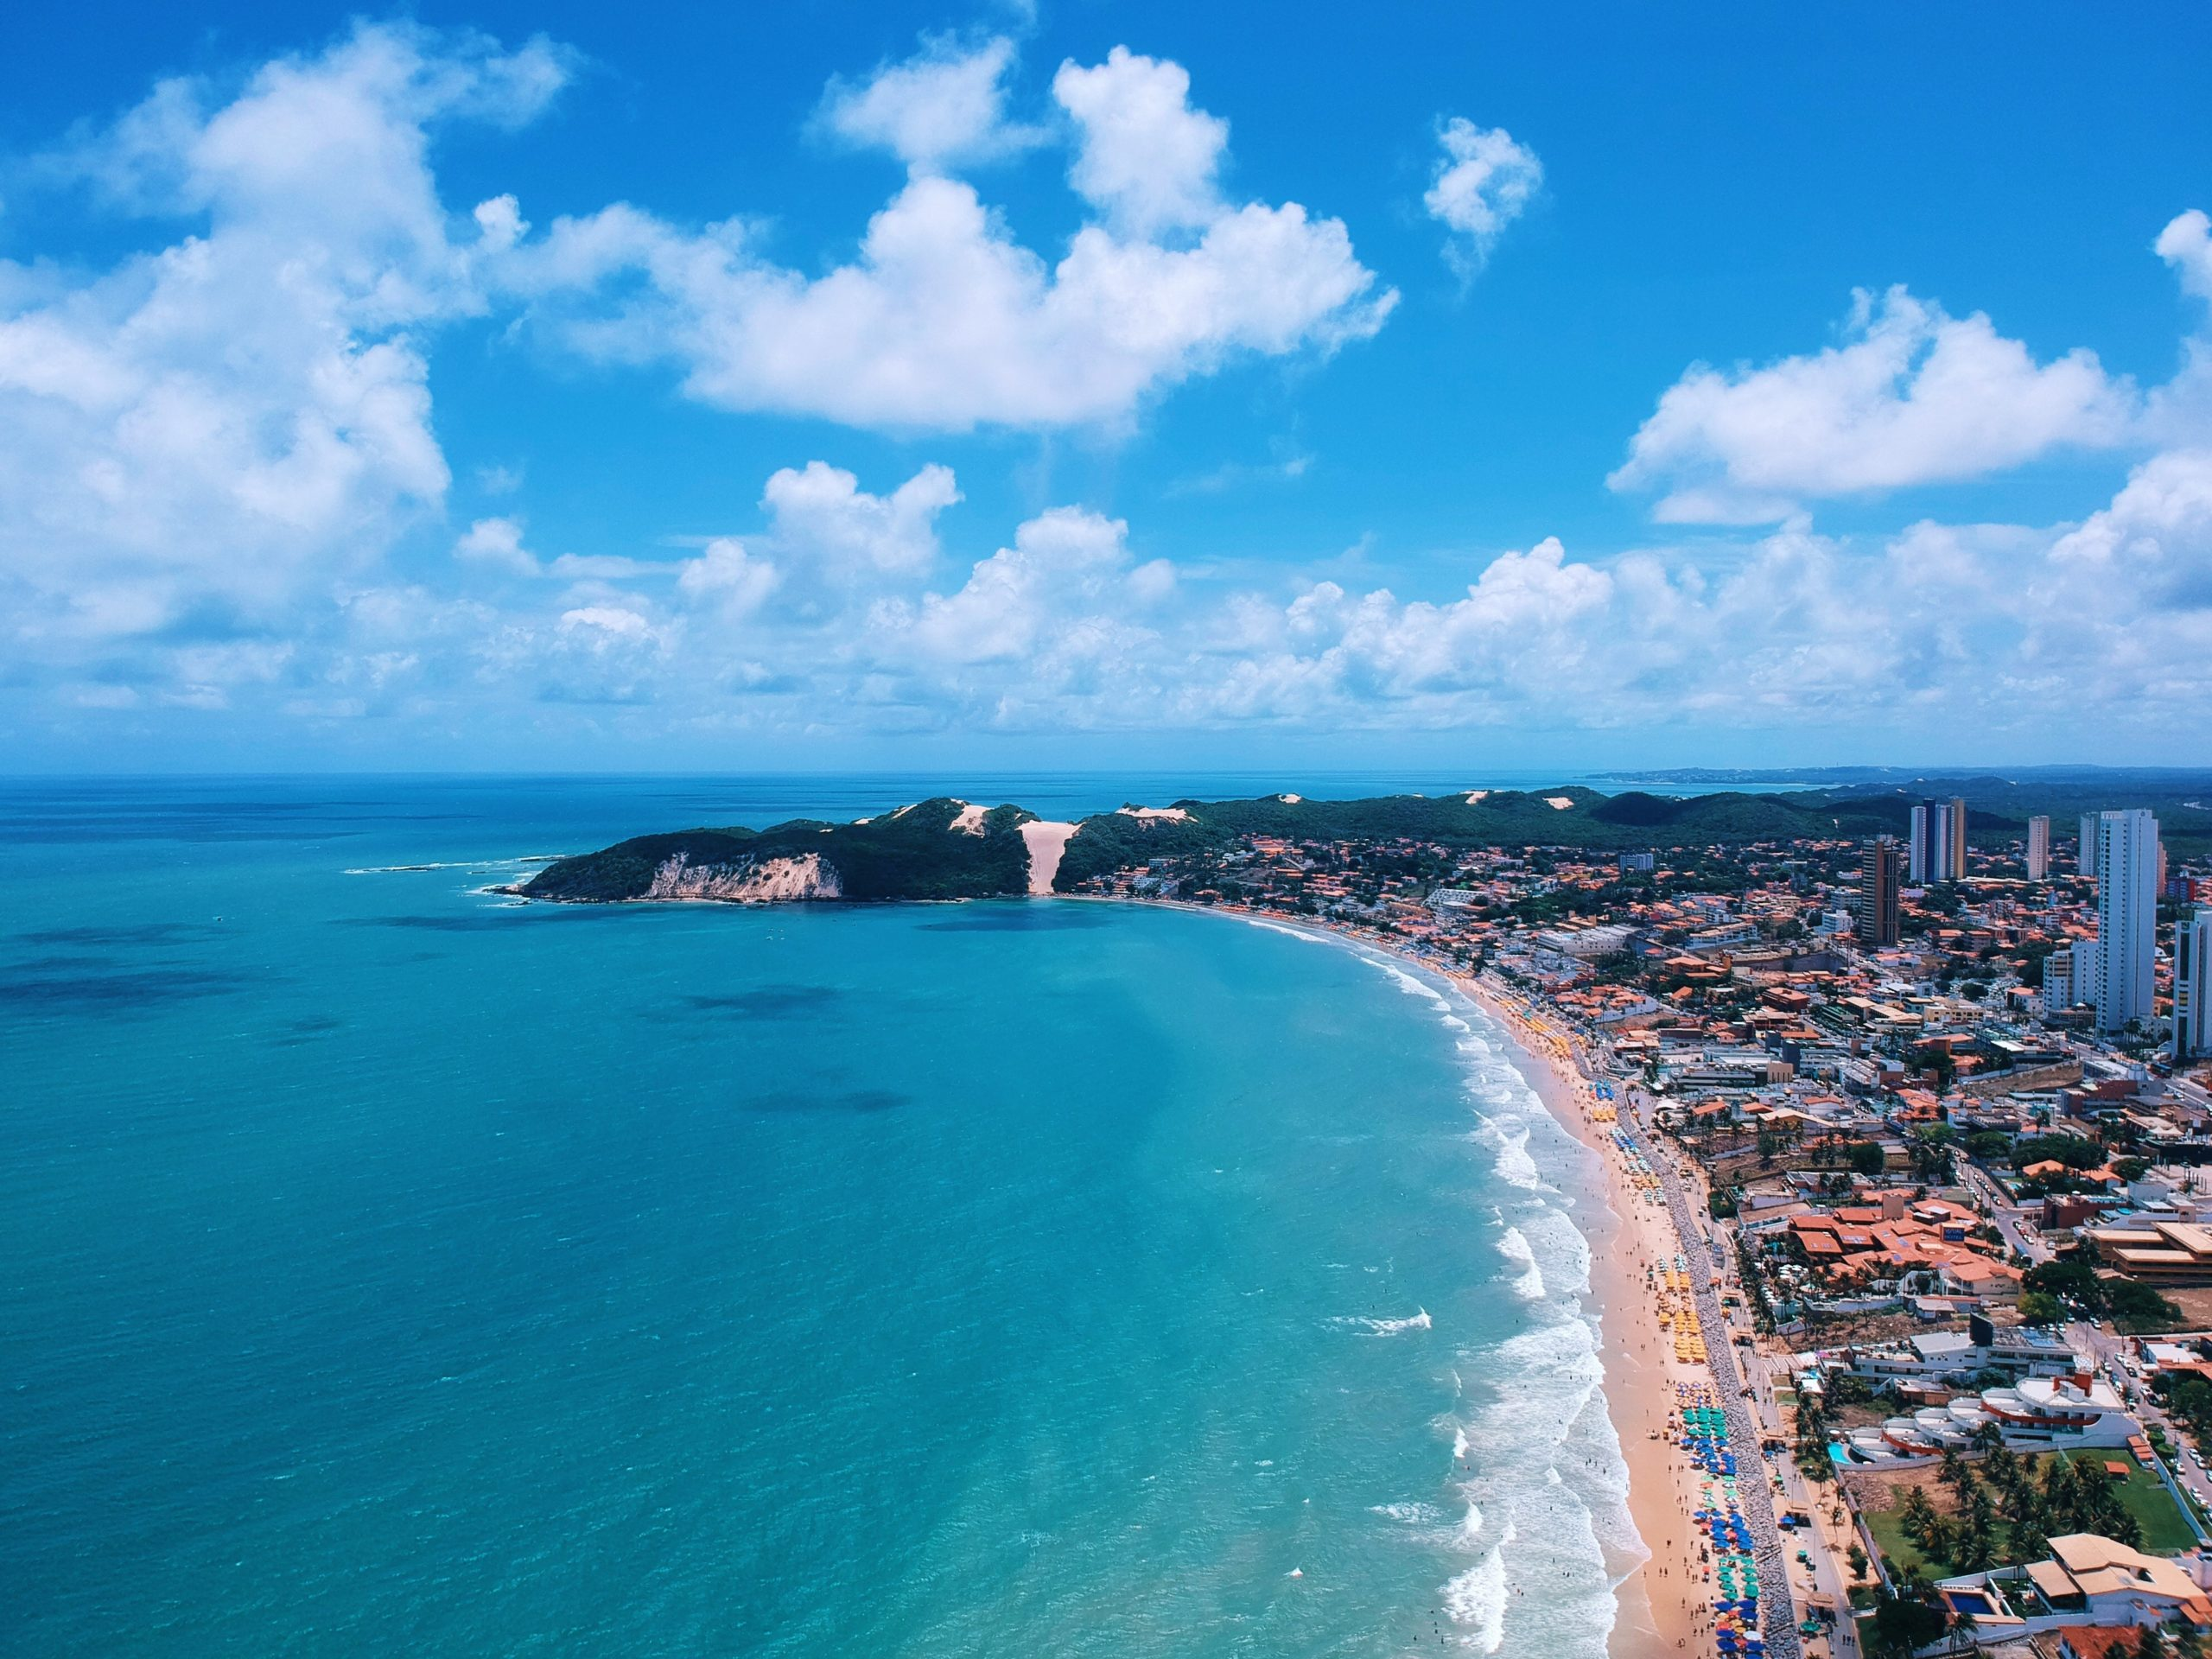 O desastre natural passaria devastando cidades como Salvador, Recife, Fortaleza, Aracaju, entre outras. (Foto: Unsplash)